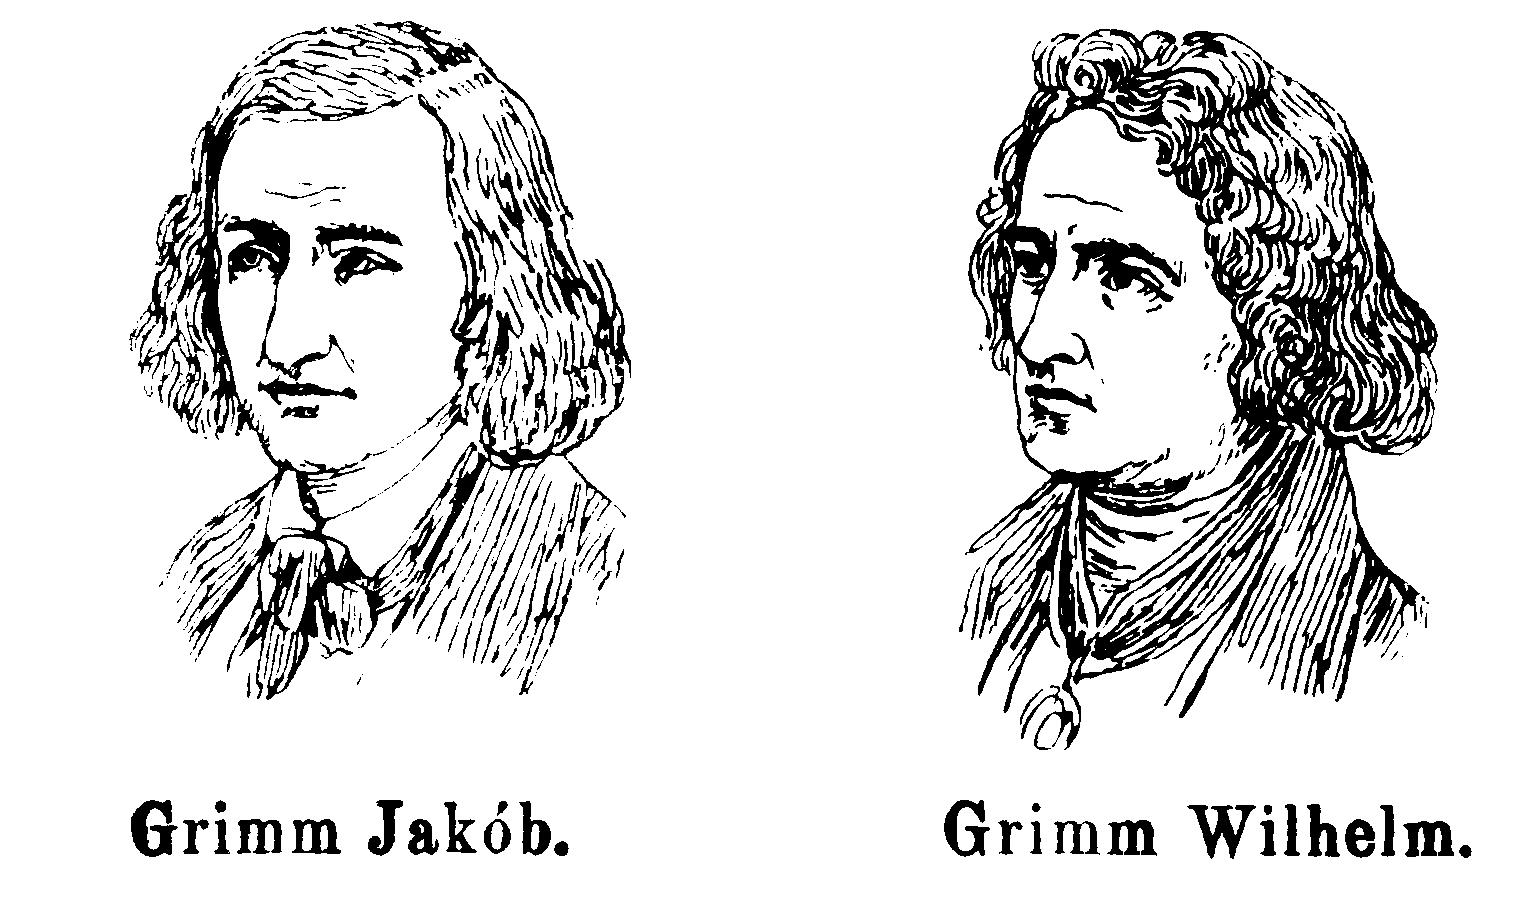 jacob grimm biography